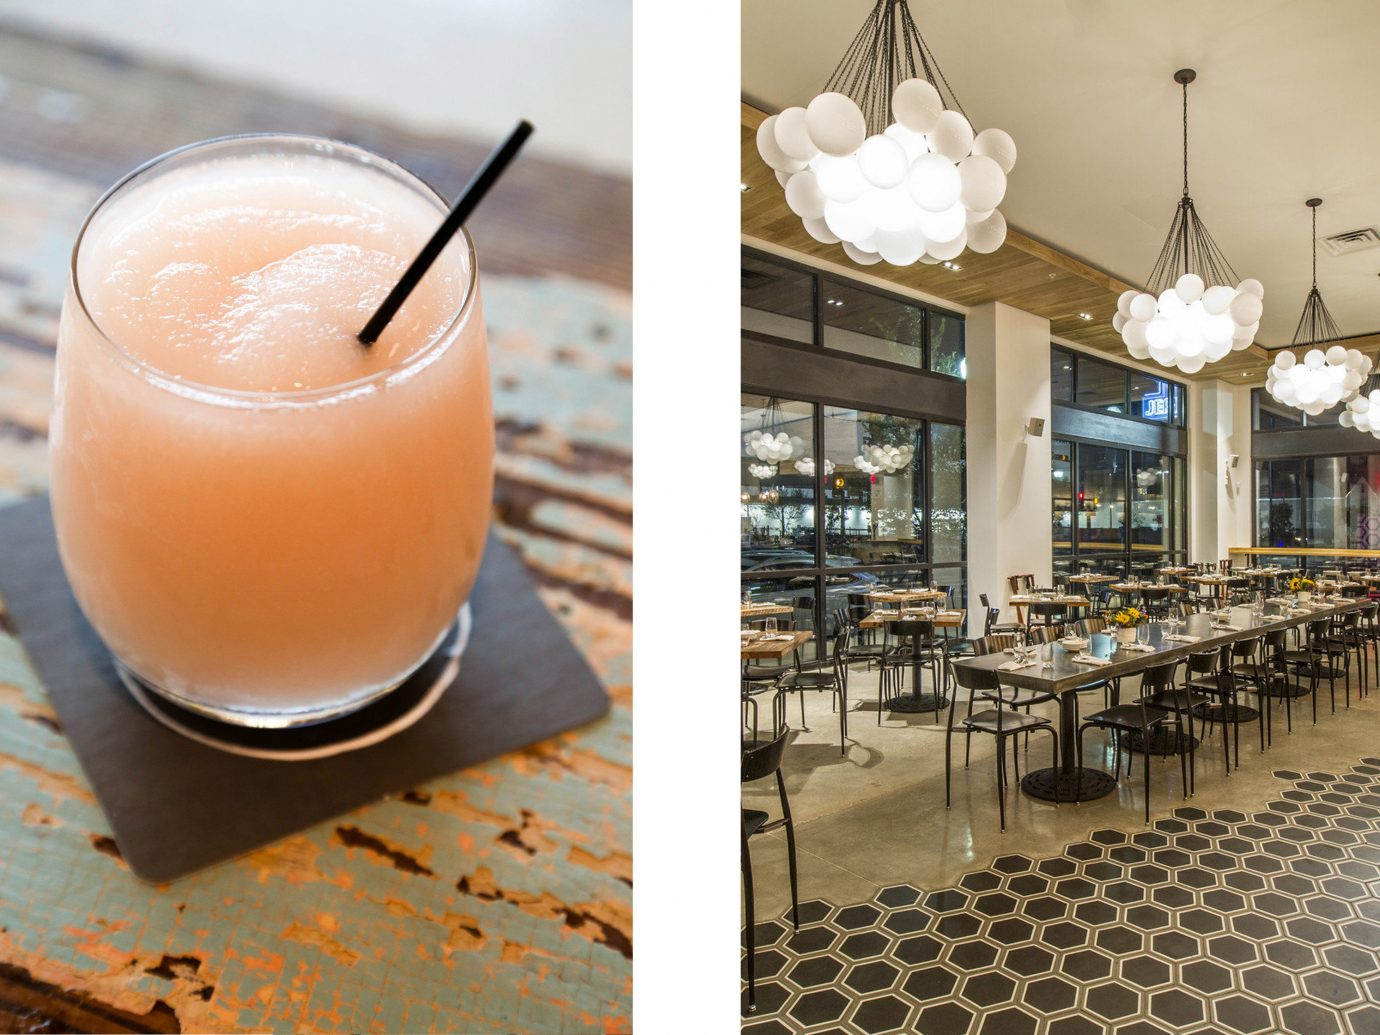 Food + Drink table cup coffee indoor food Drink glass beverage meal brunch fruit drink